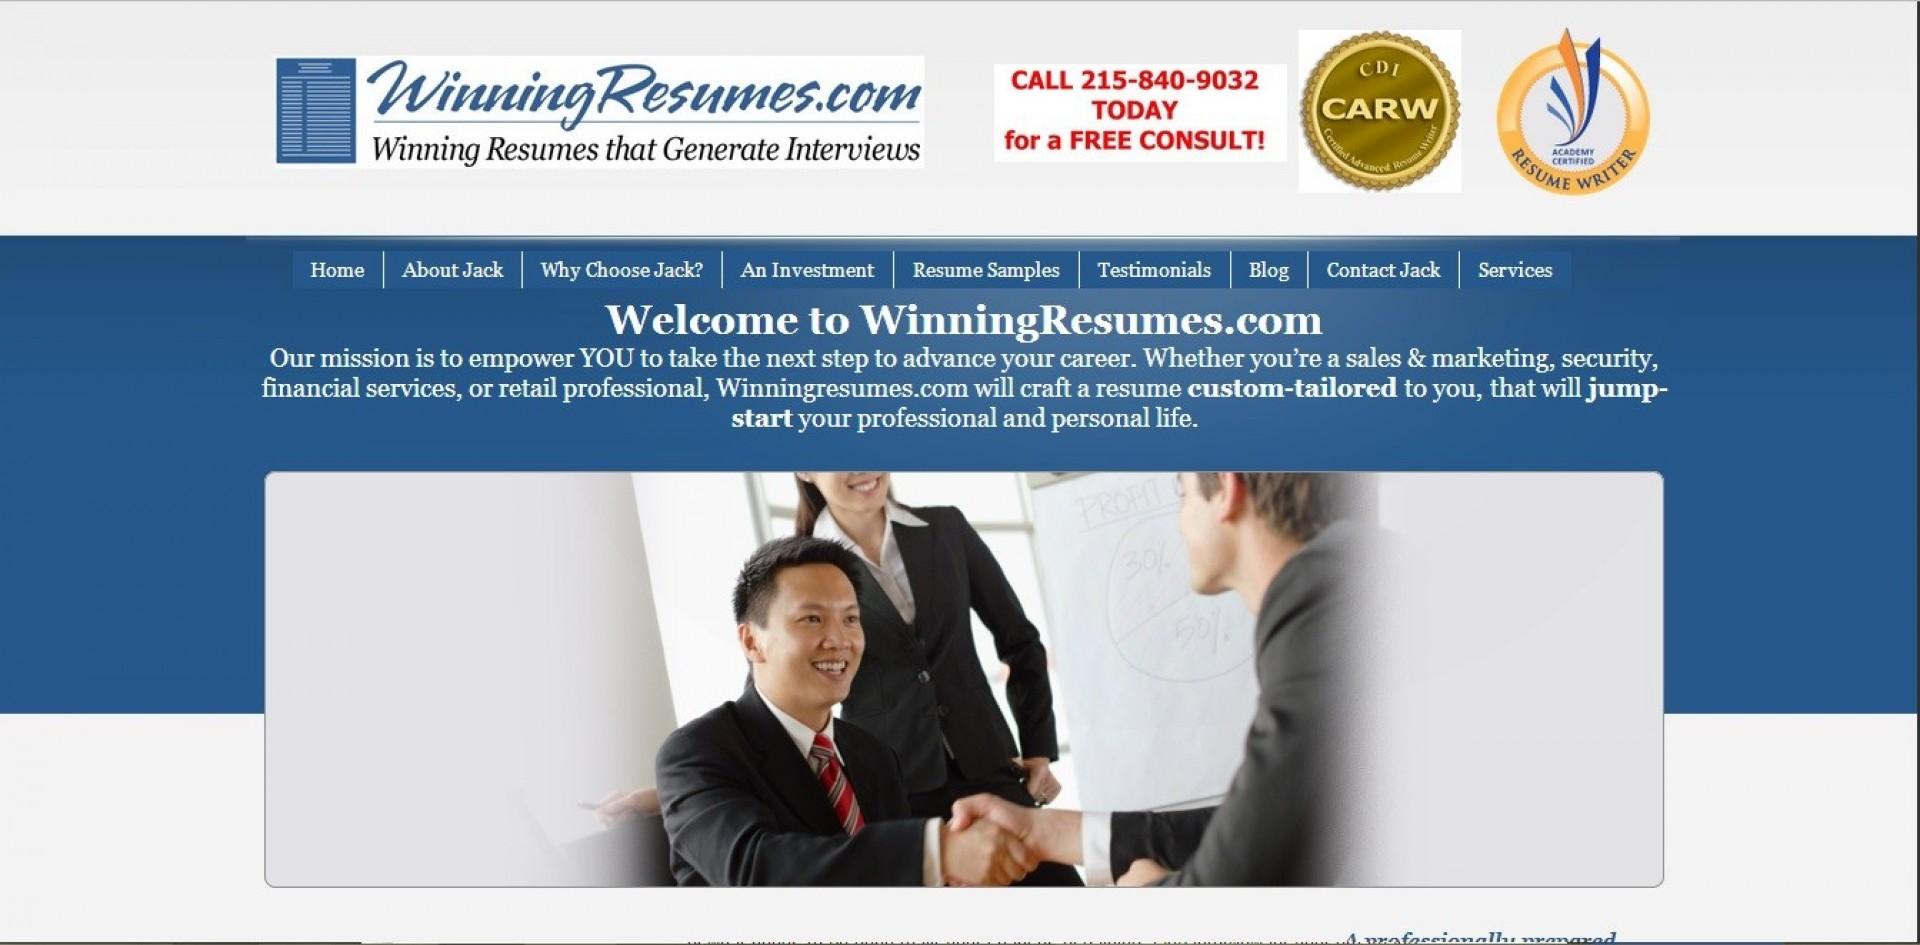 006 Winningresumes Com Review Essay Example Custom Writing Impressive Service Are Services Legal Australia 1920